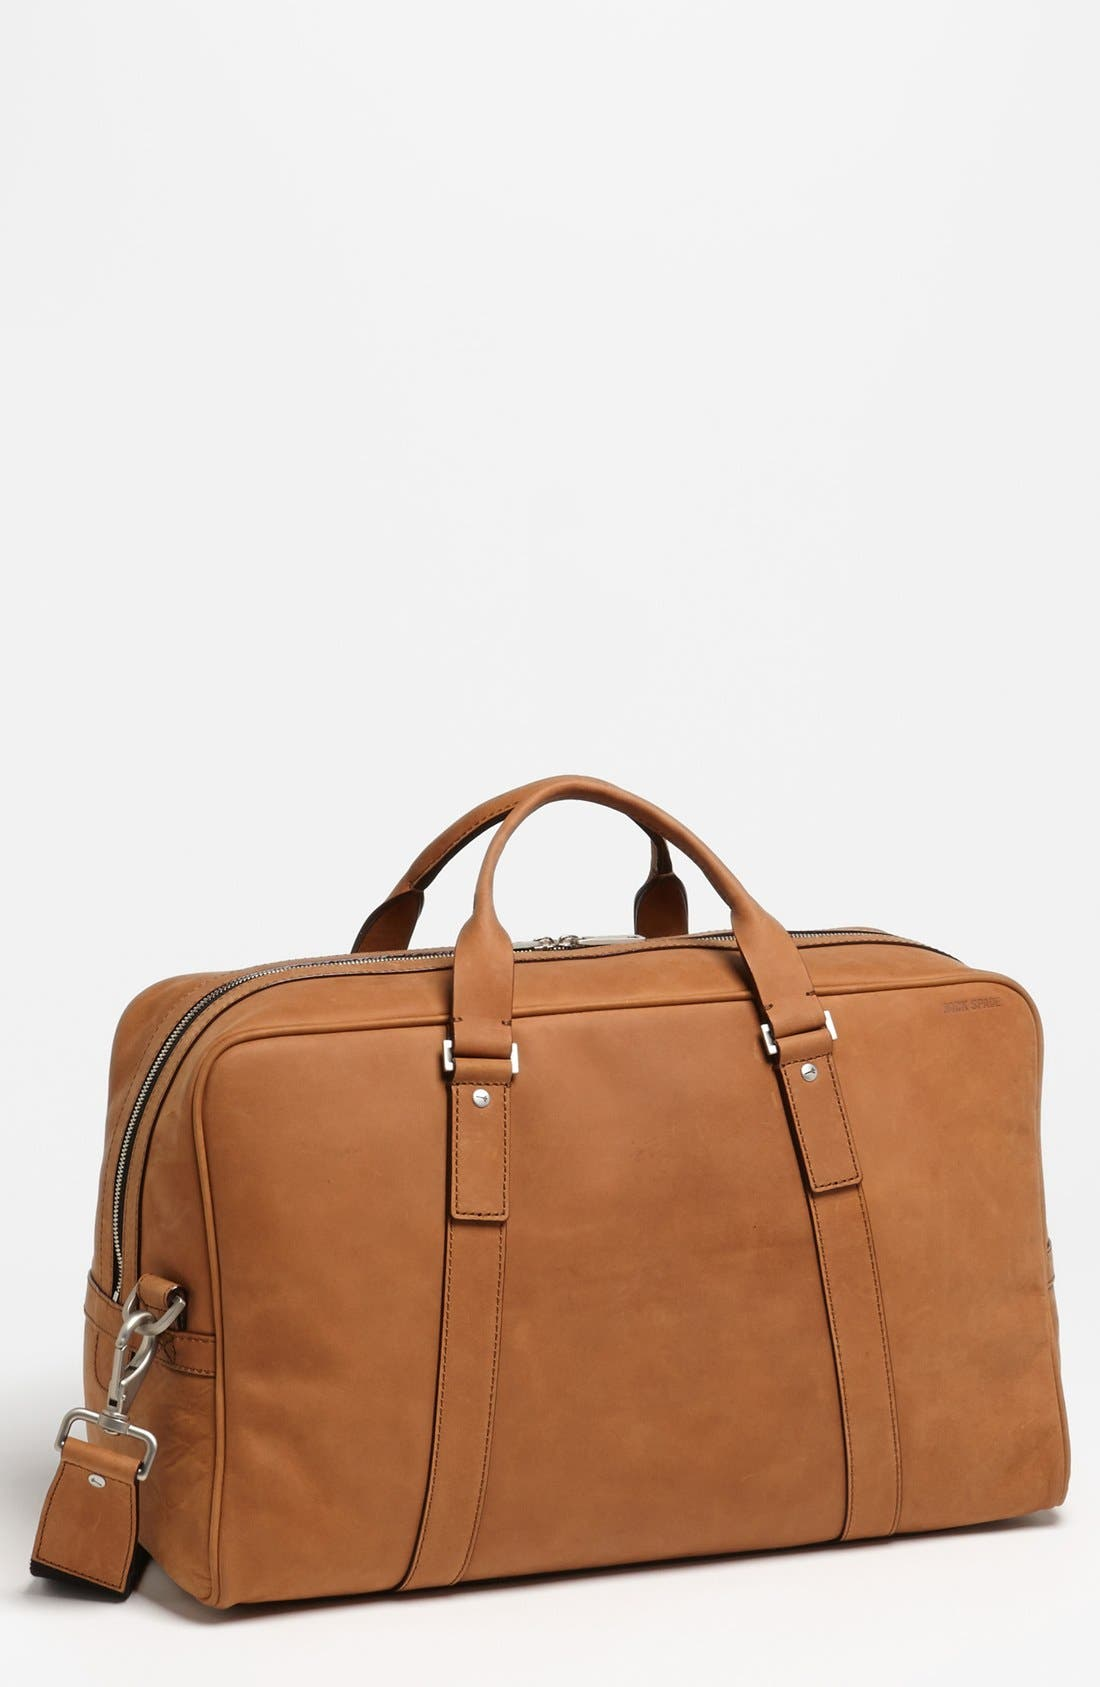 Main Image - Jack Spade 'Small - Eaton' Duffel Bag